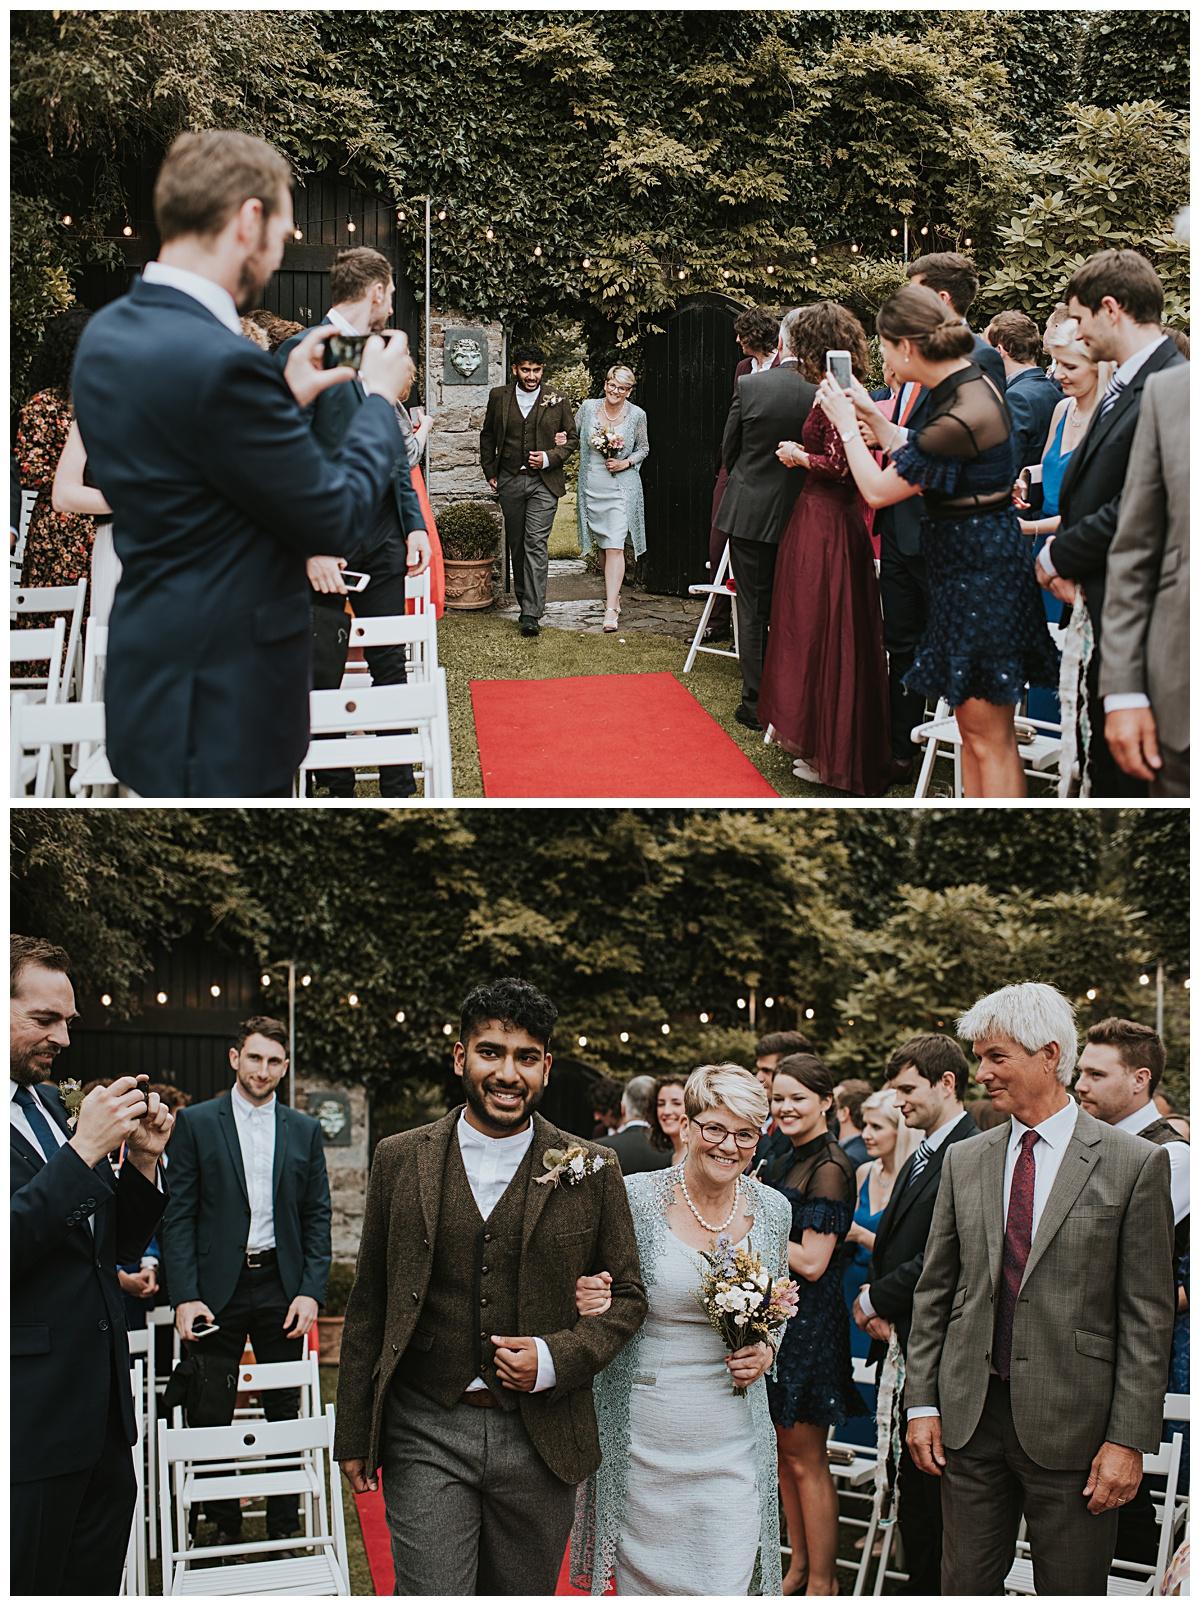 blairscove wedding